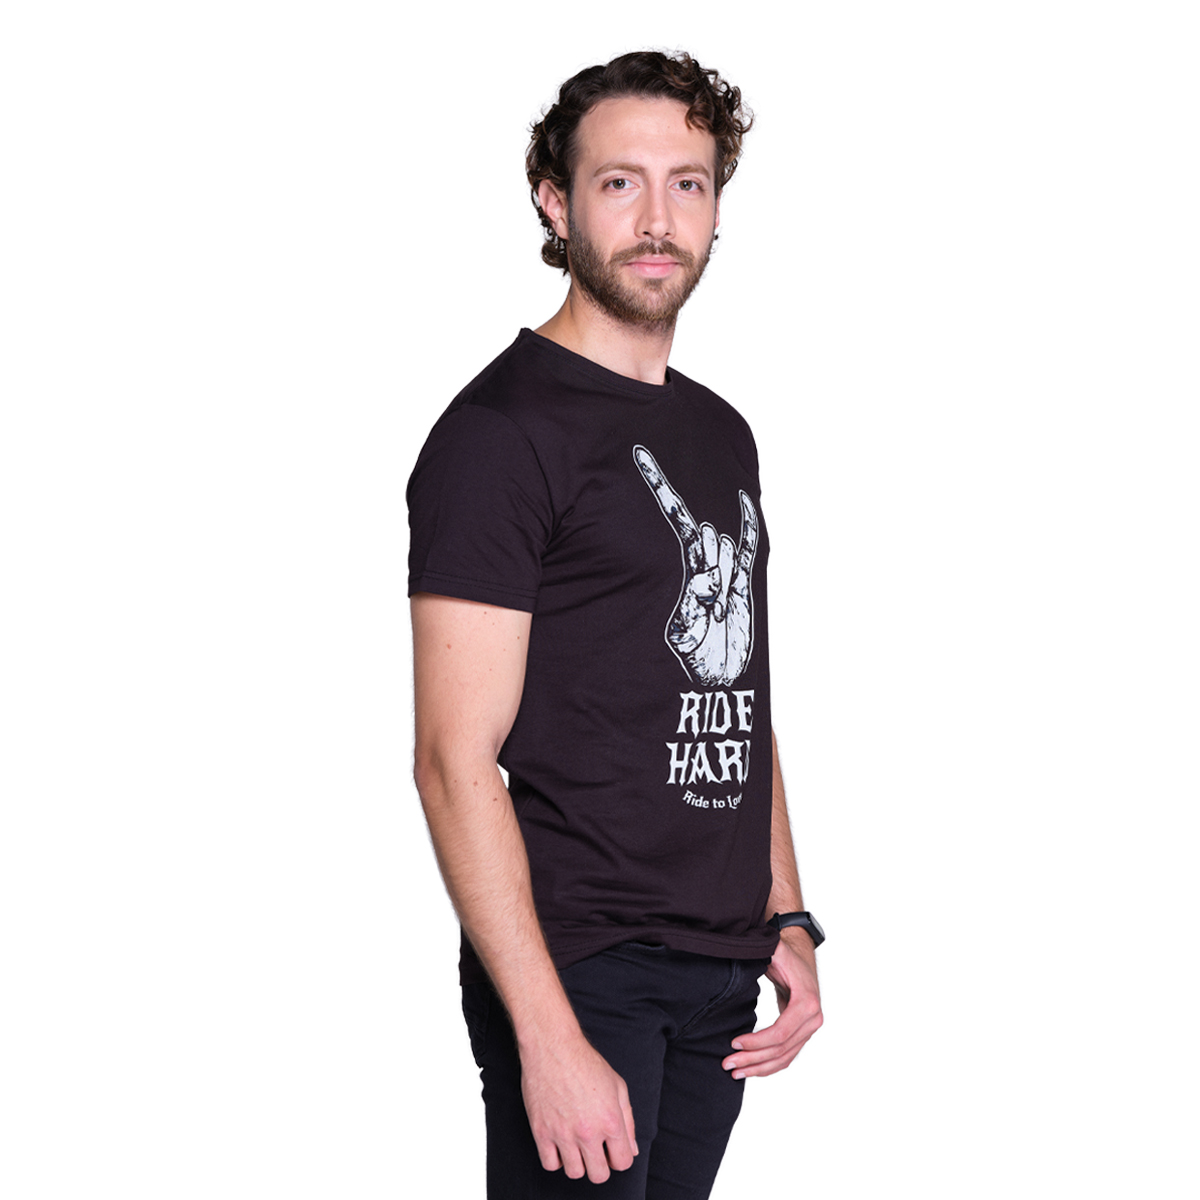 Ride to Love - Ride Hard Black T-shirt